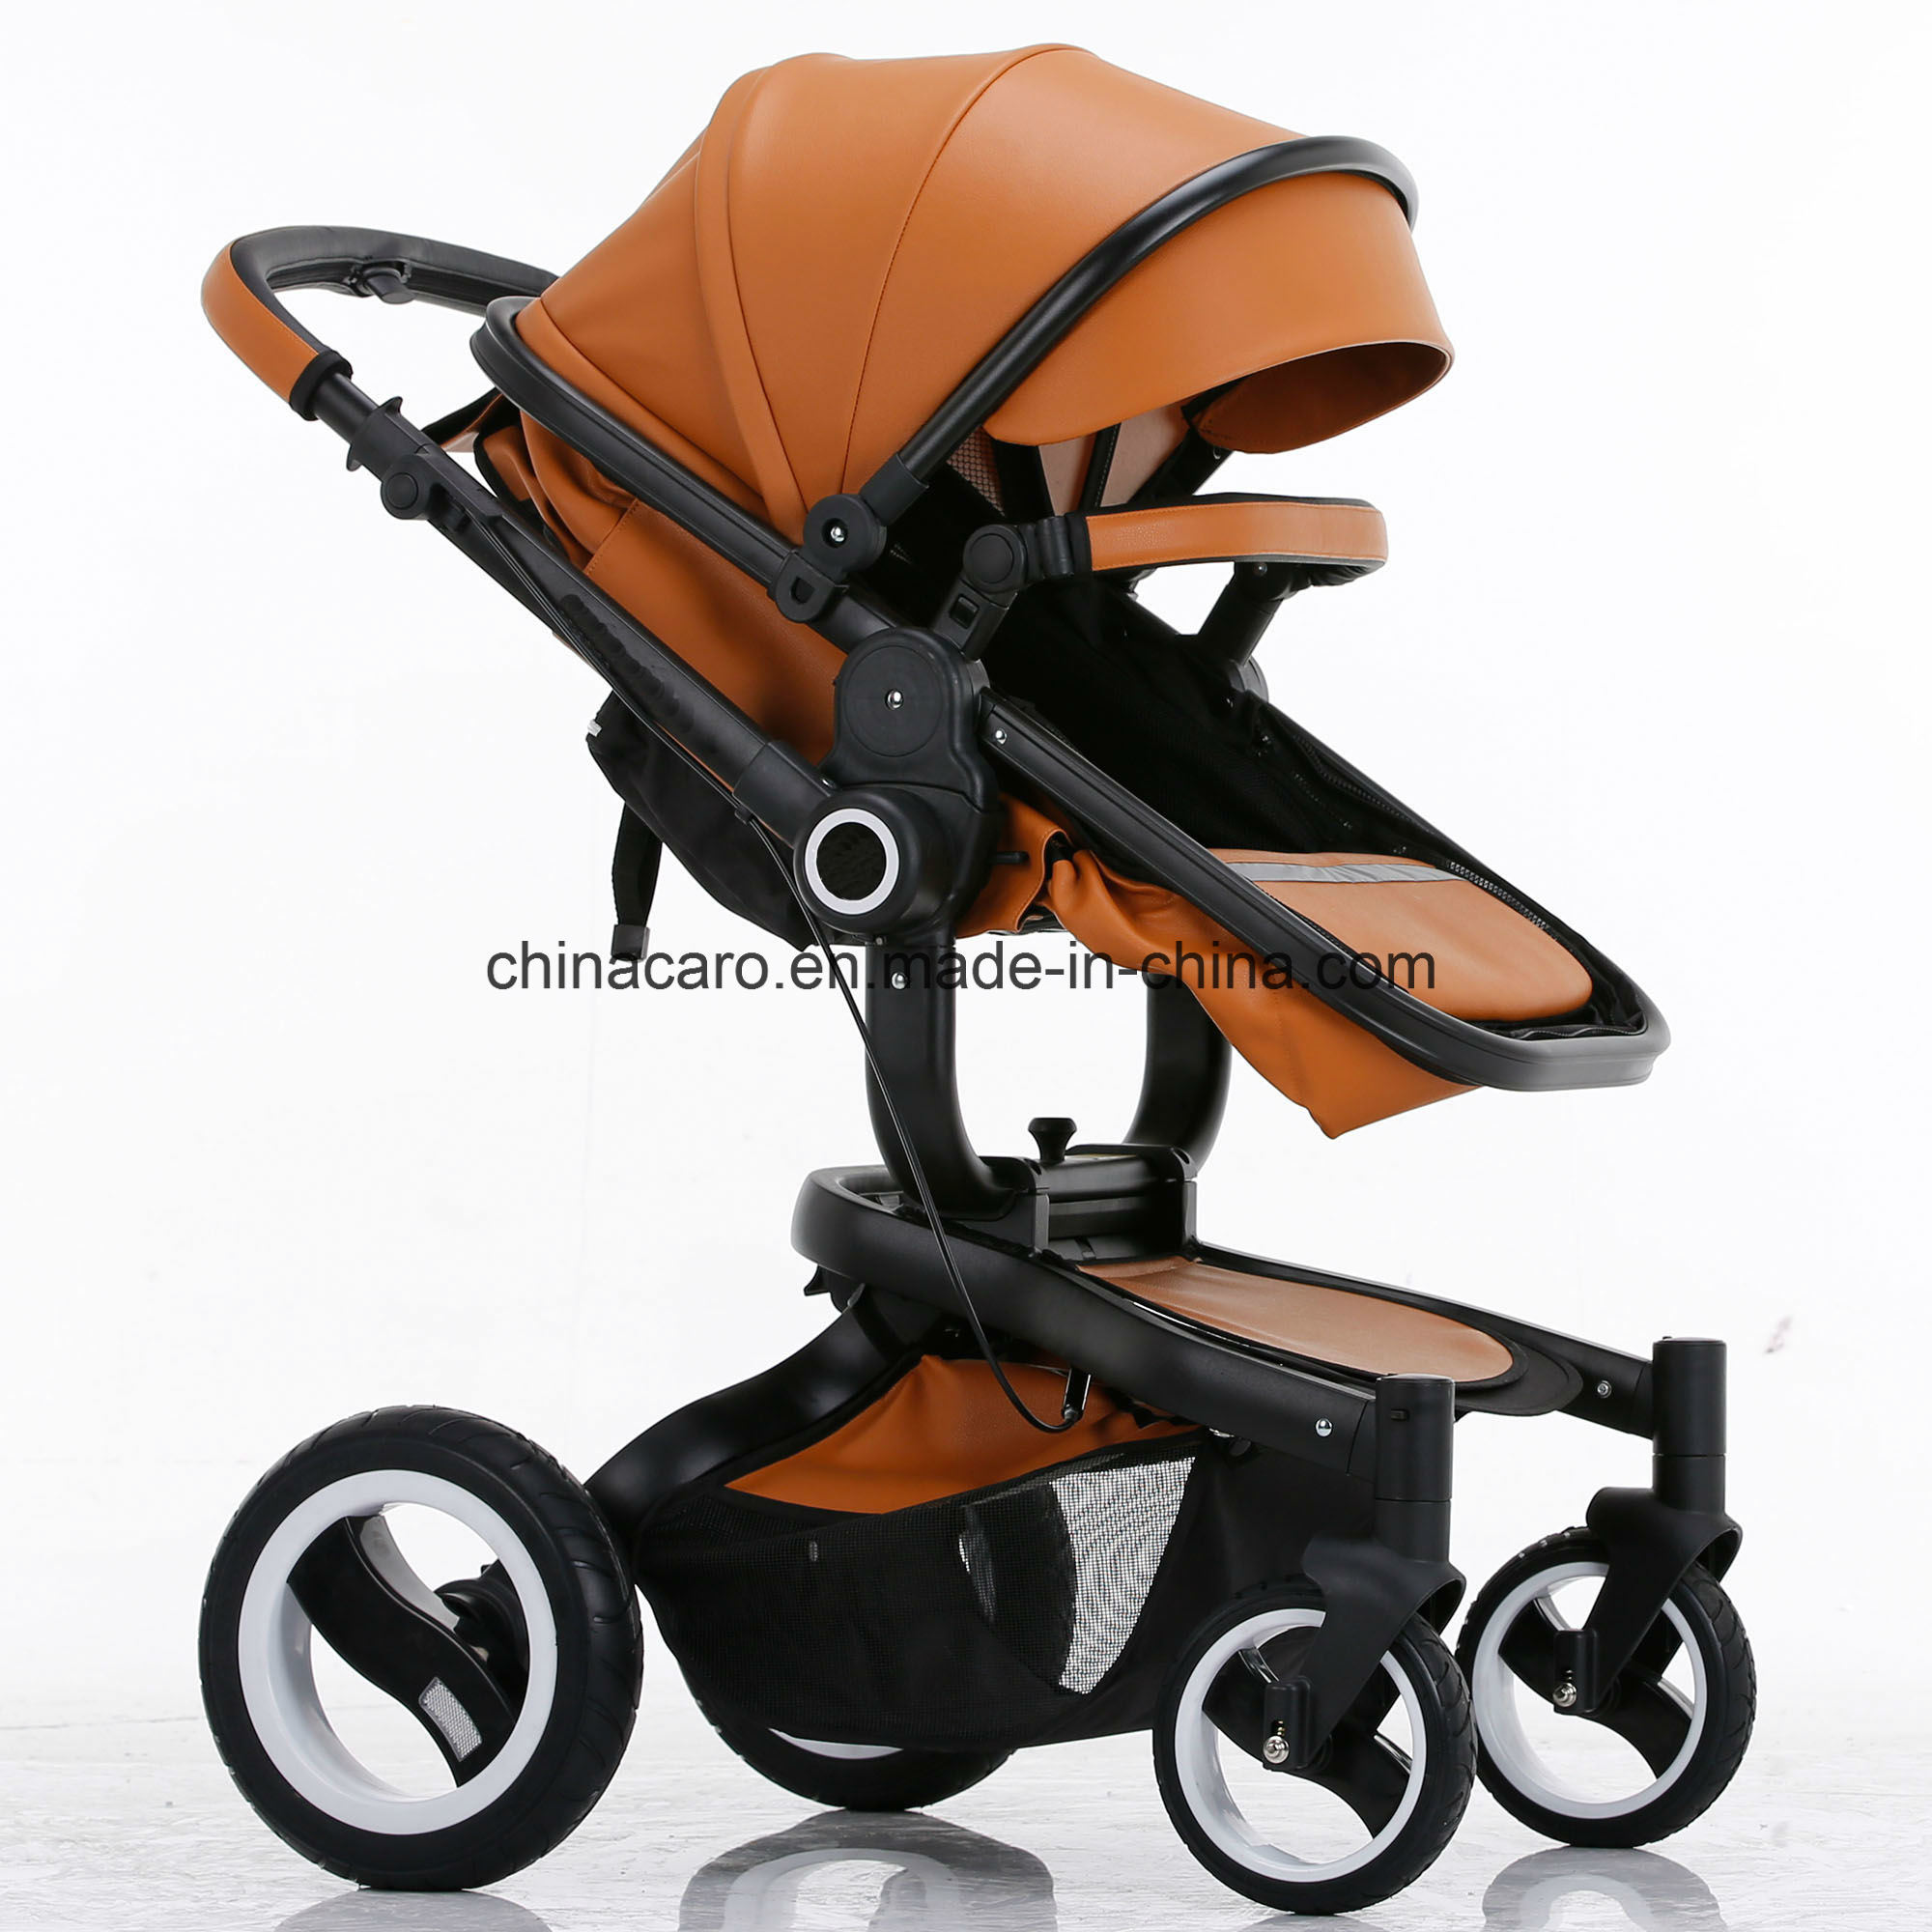 2017 New Design Luxury Fold Baby Stroller with European Standard